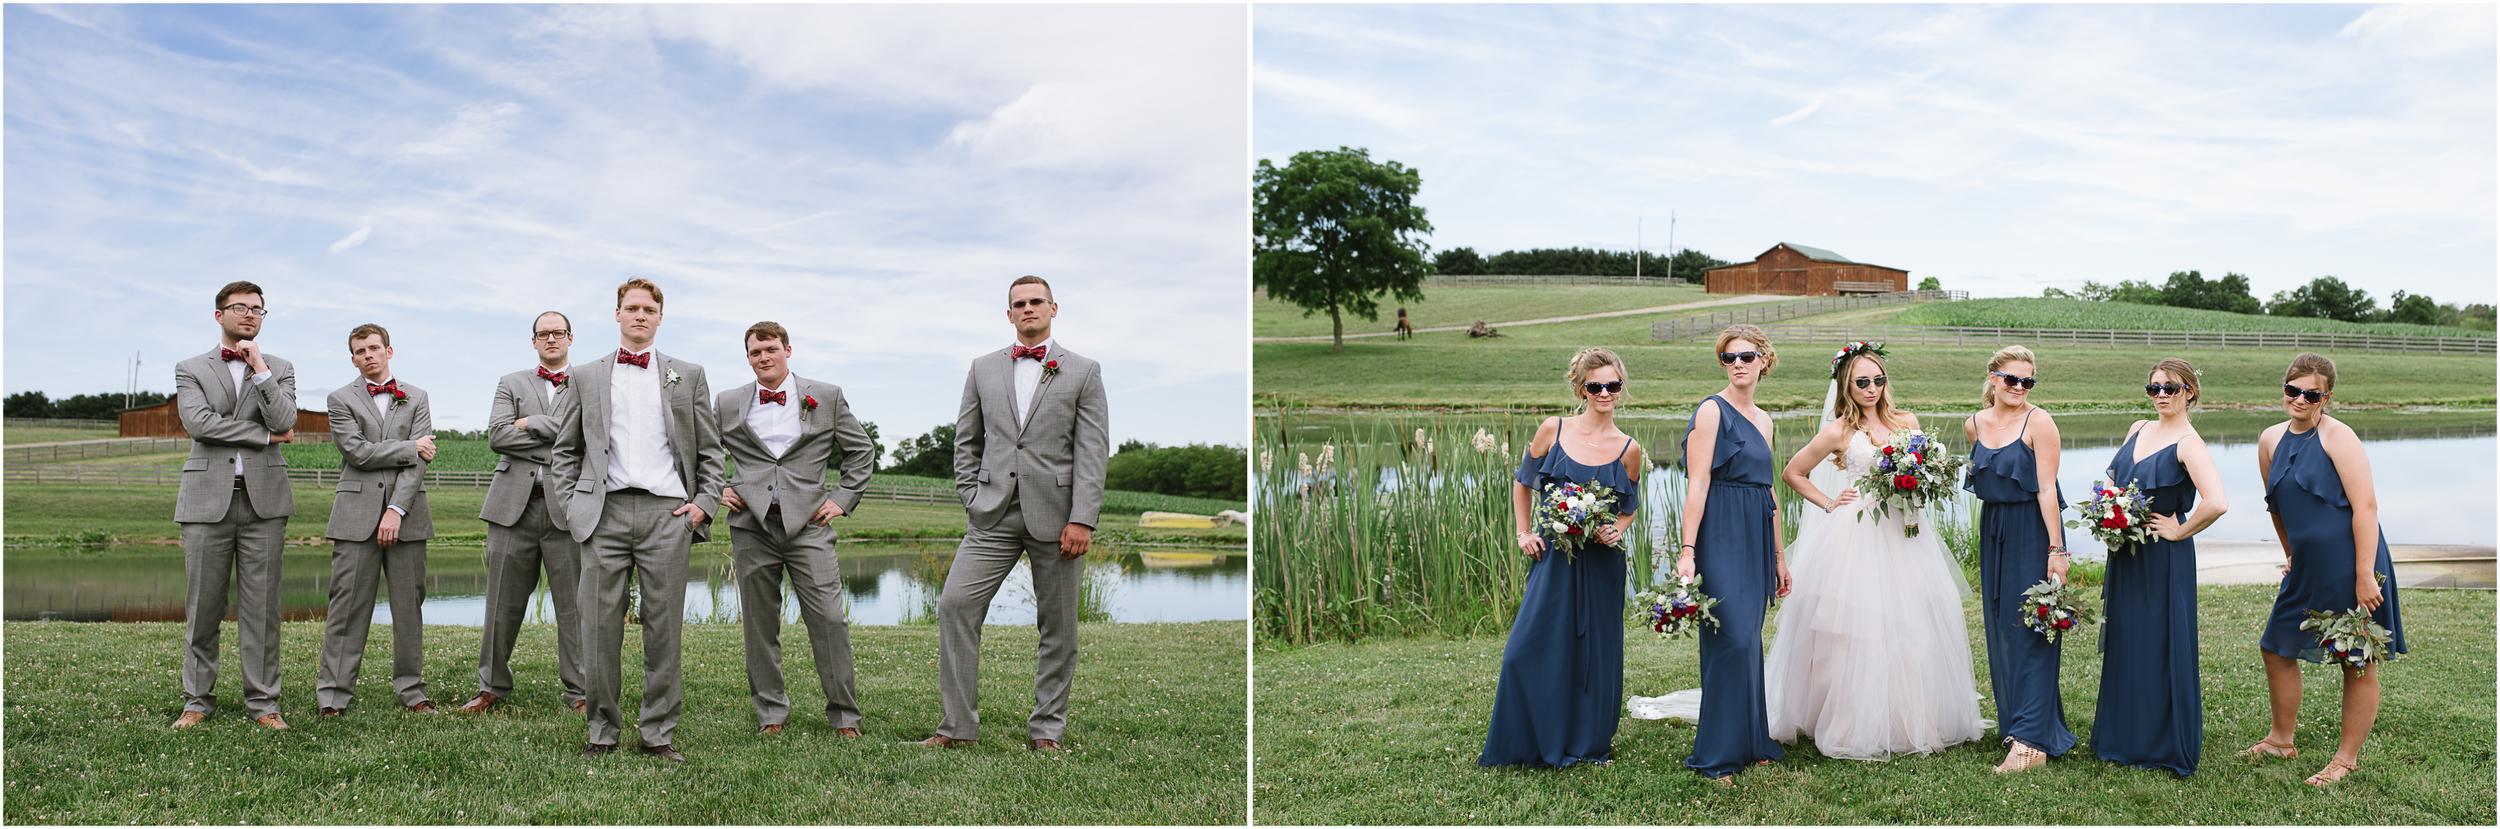 lingrow farm bridal party photos.jpg